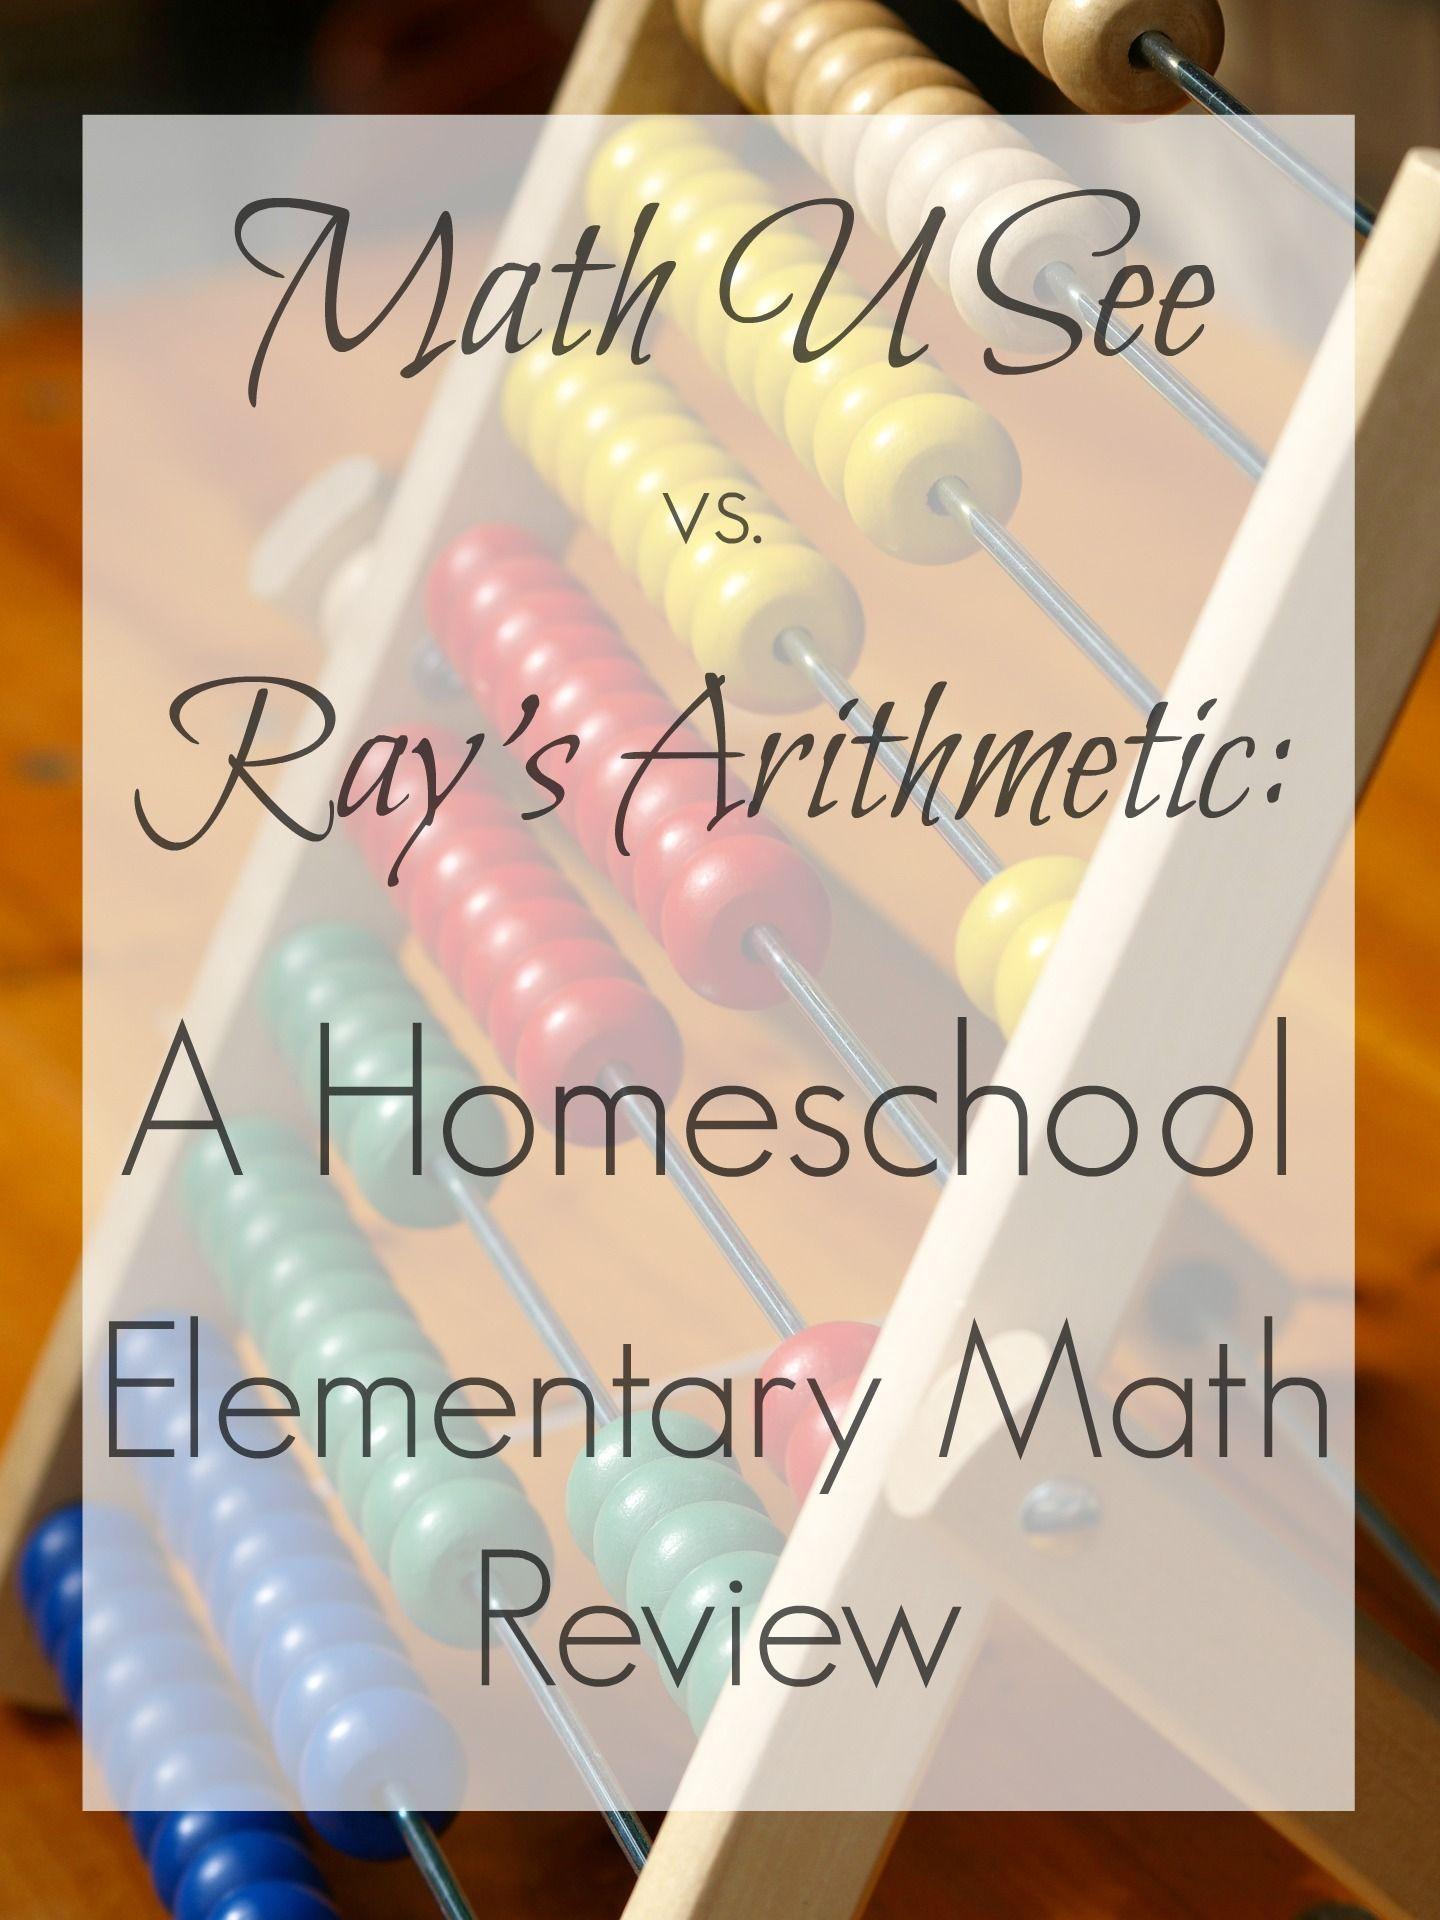 Math U See Vs Ray S Arithmetic A Review The Green Catholic Burrow Math U See Homeschool Elementary Homeschool Math